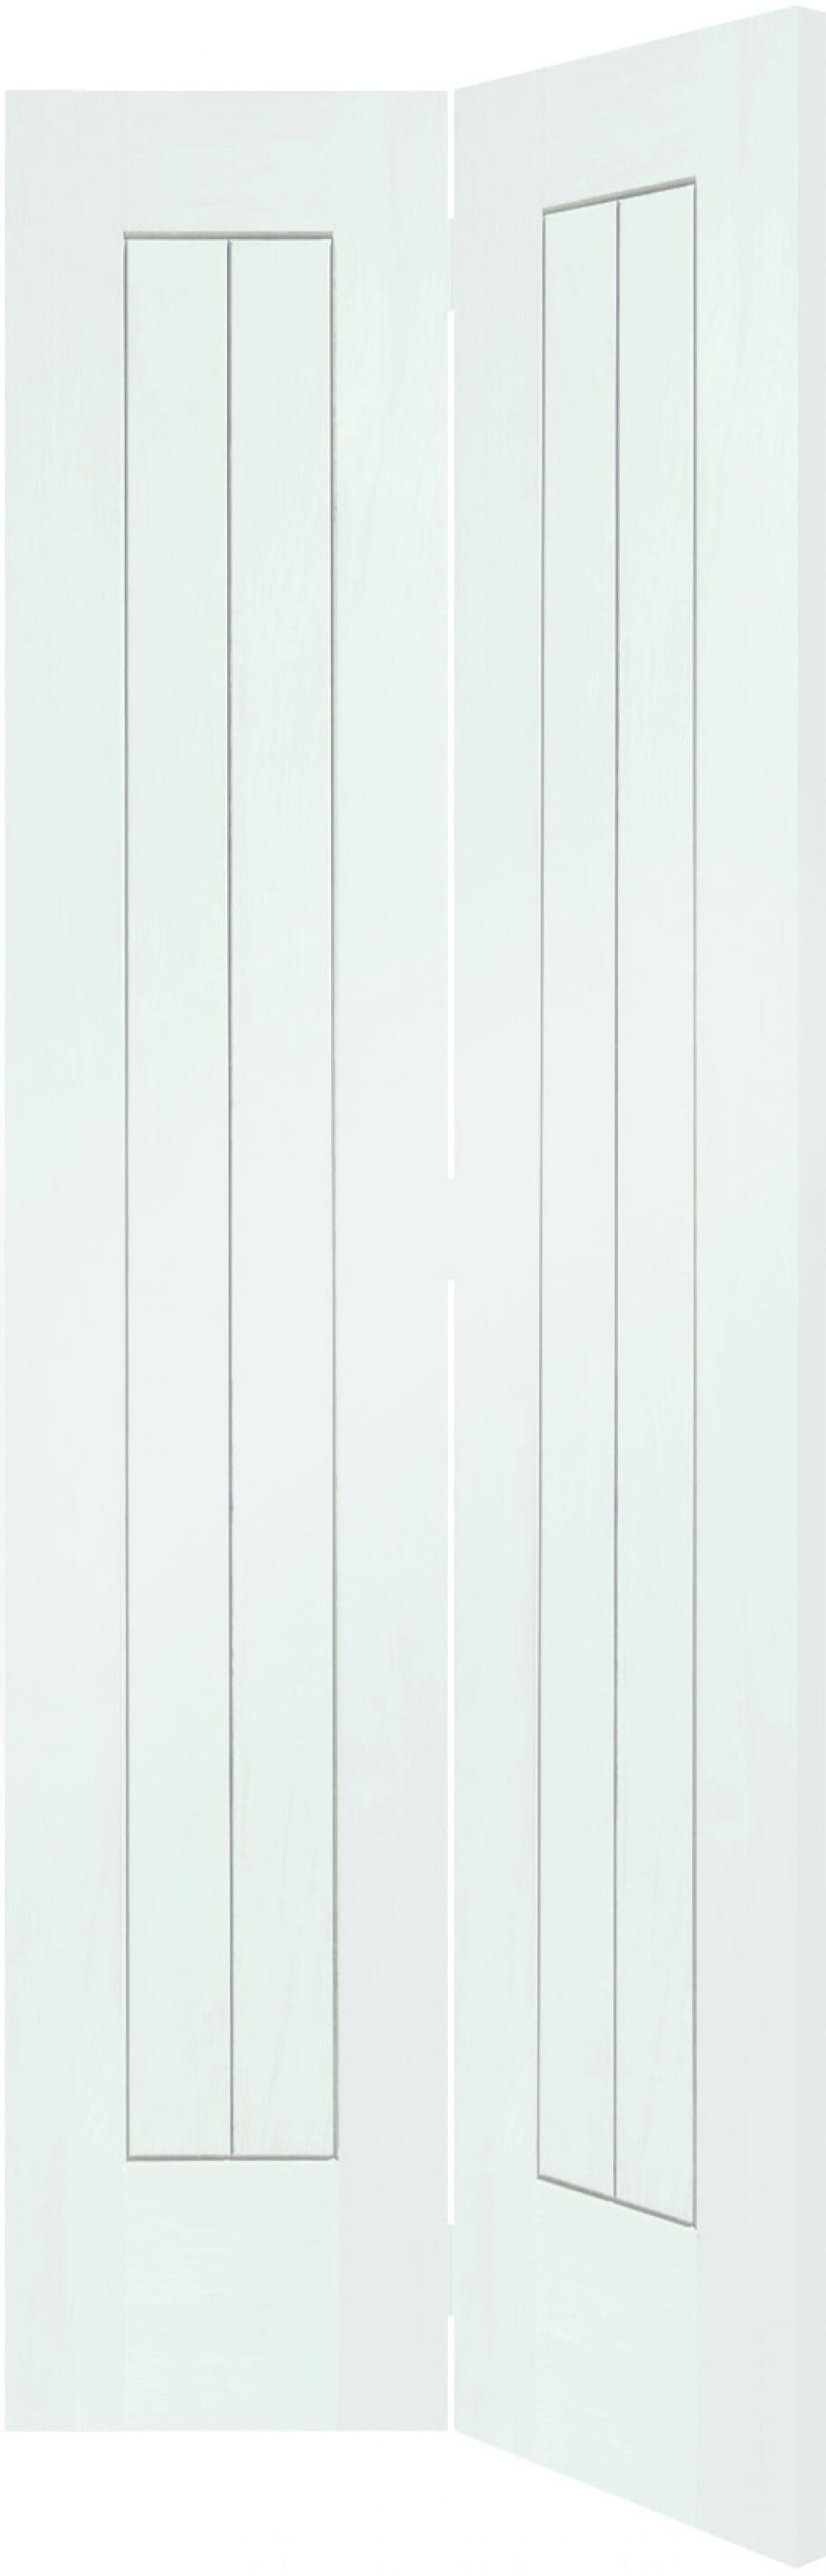 Suffolk White Bi-fold Image